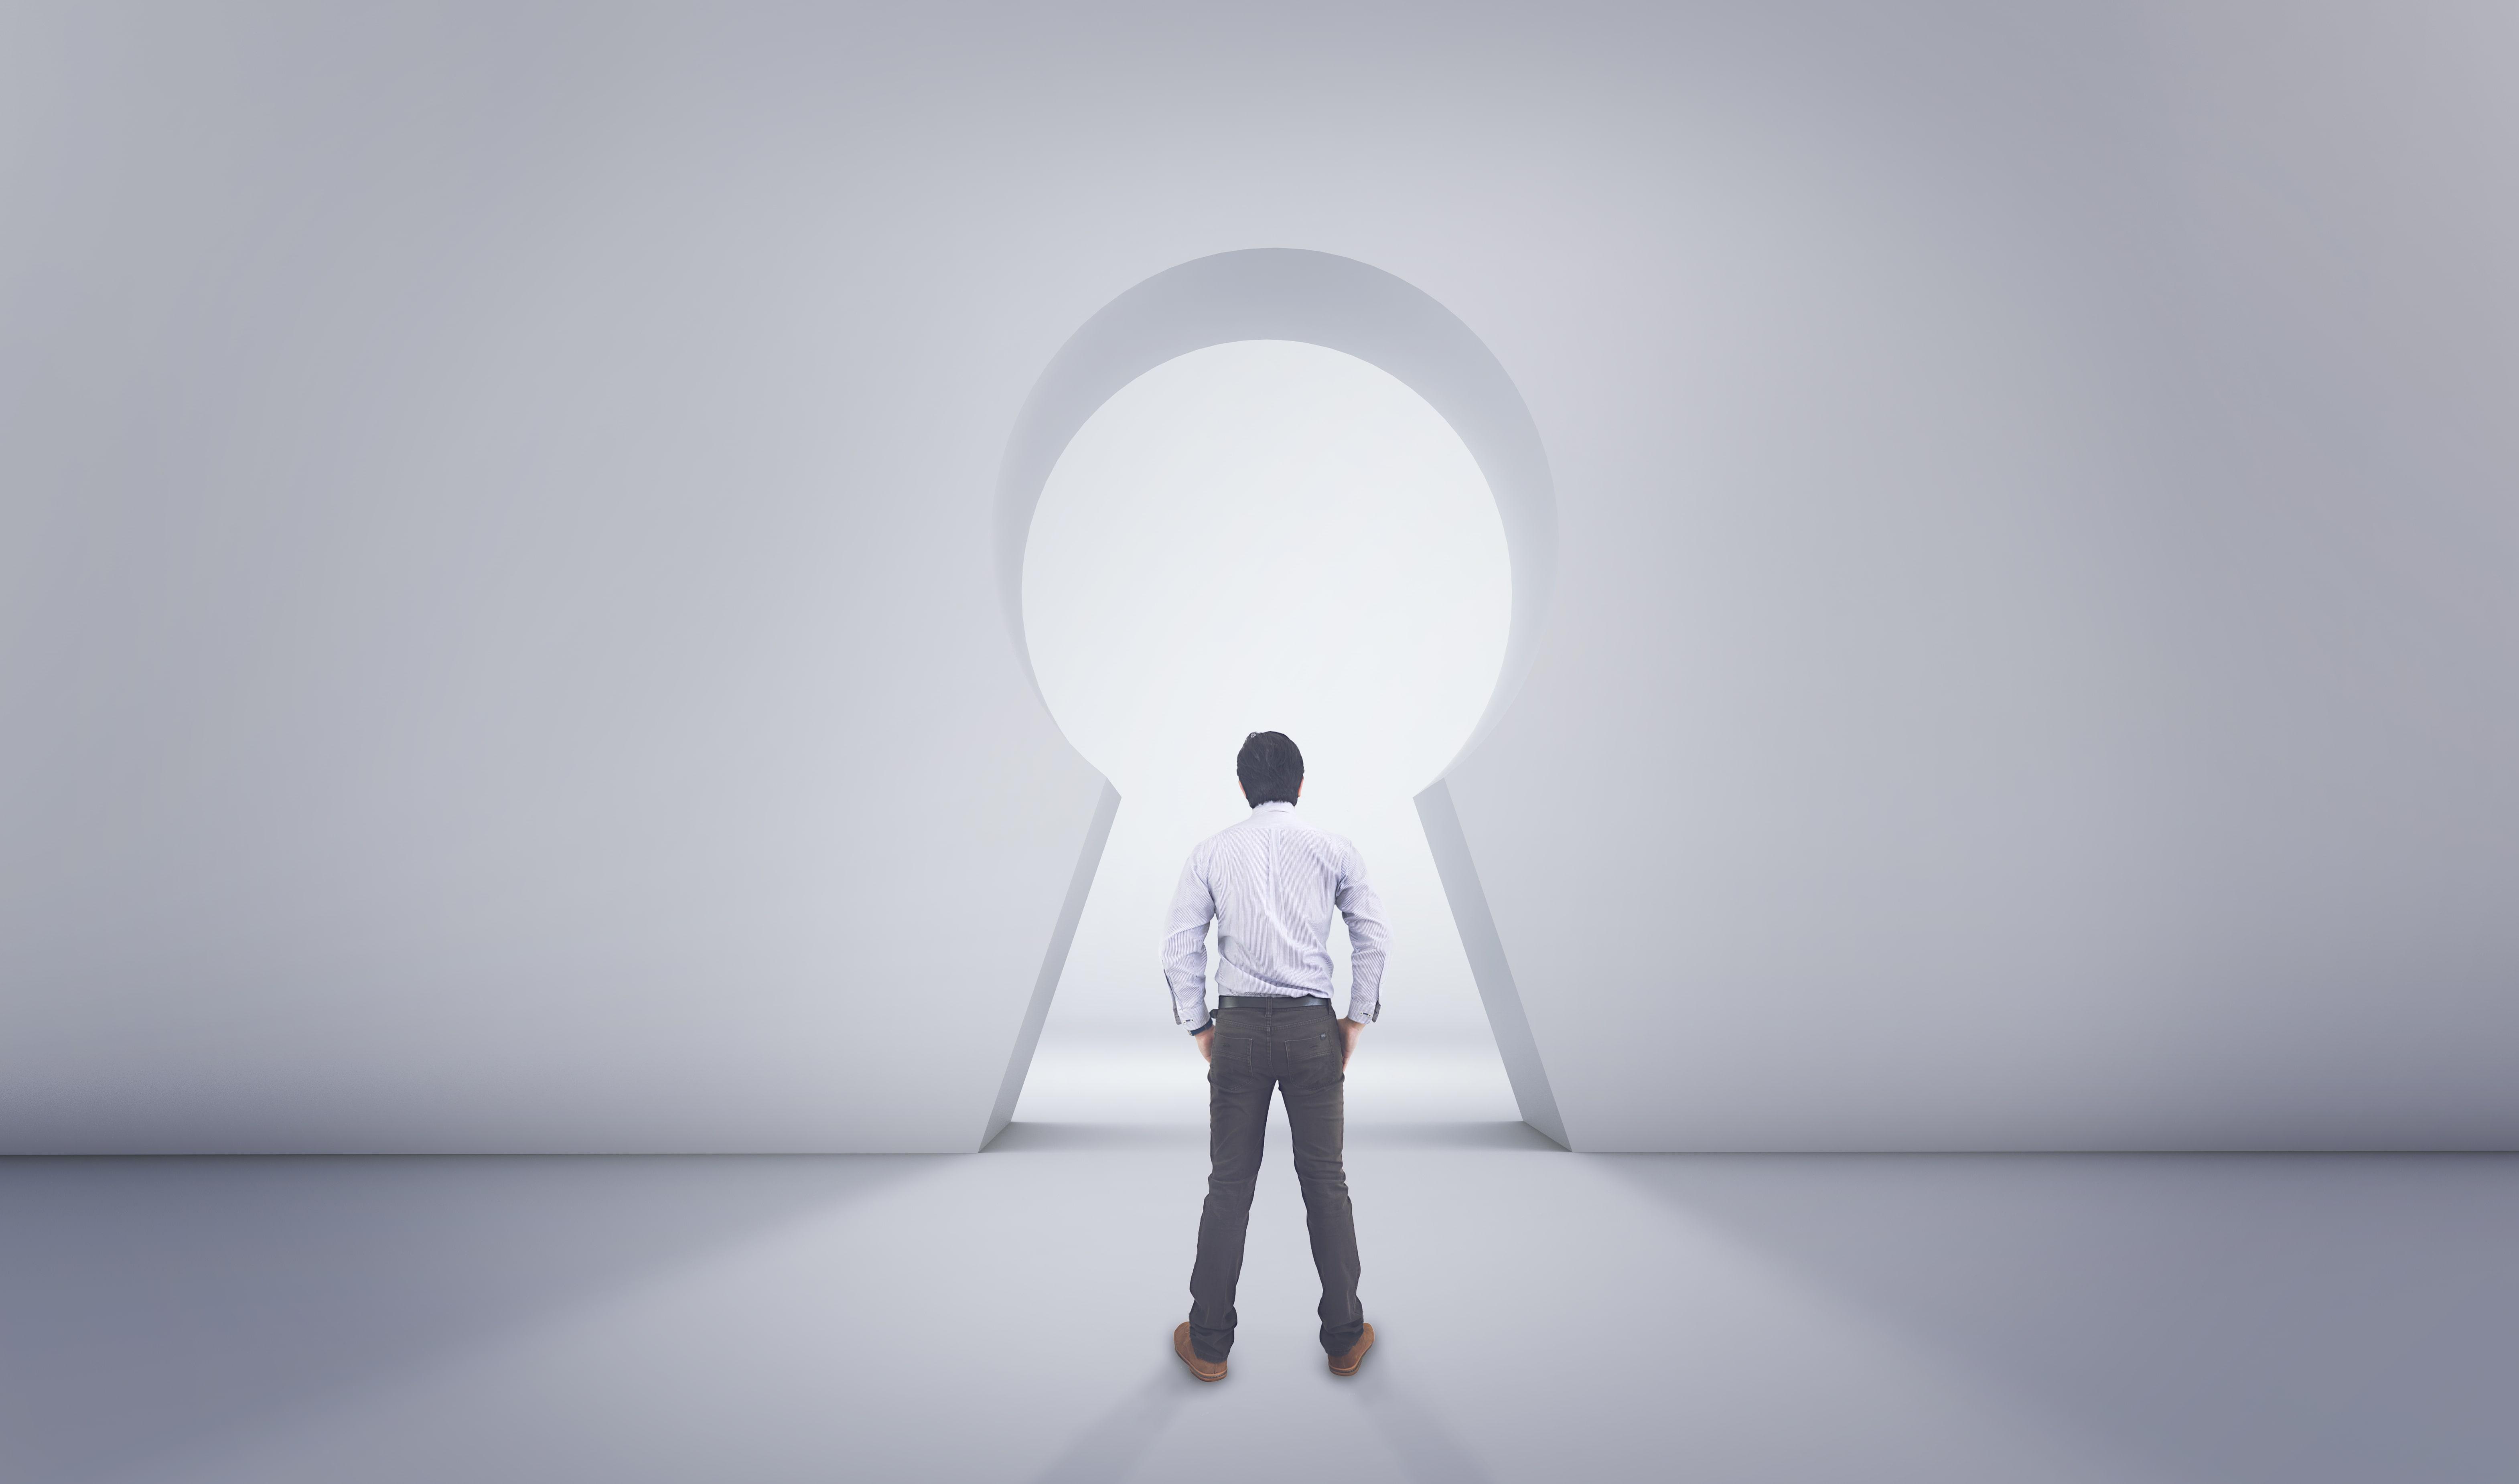 Empresas abandonan talento